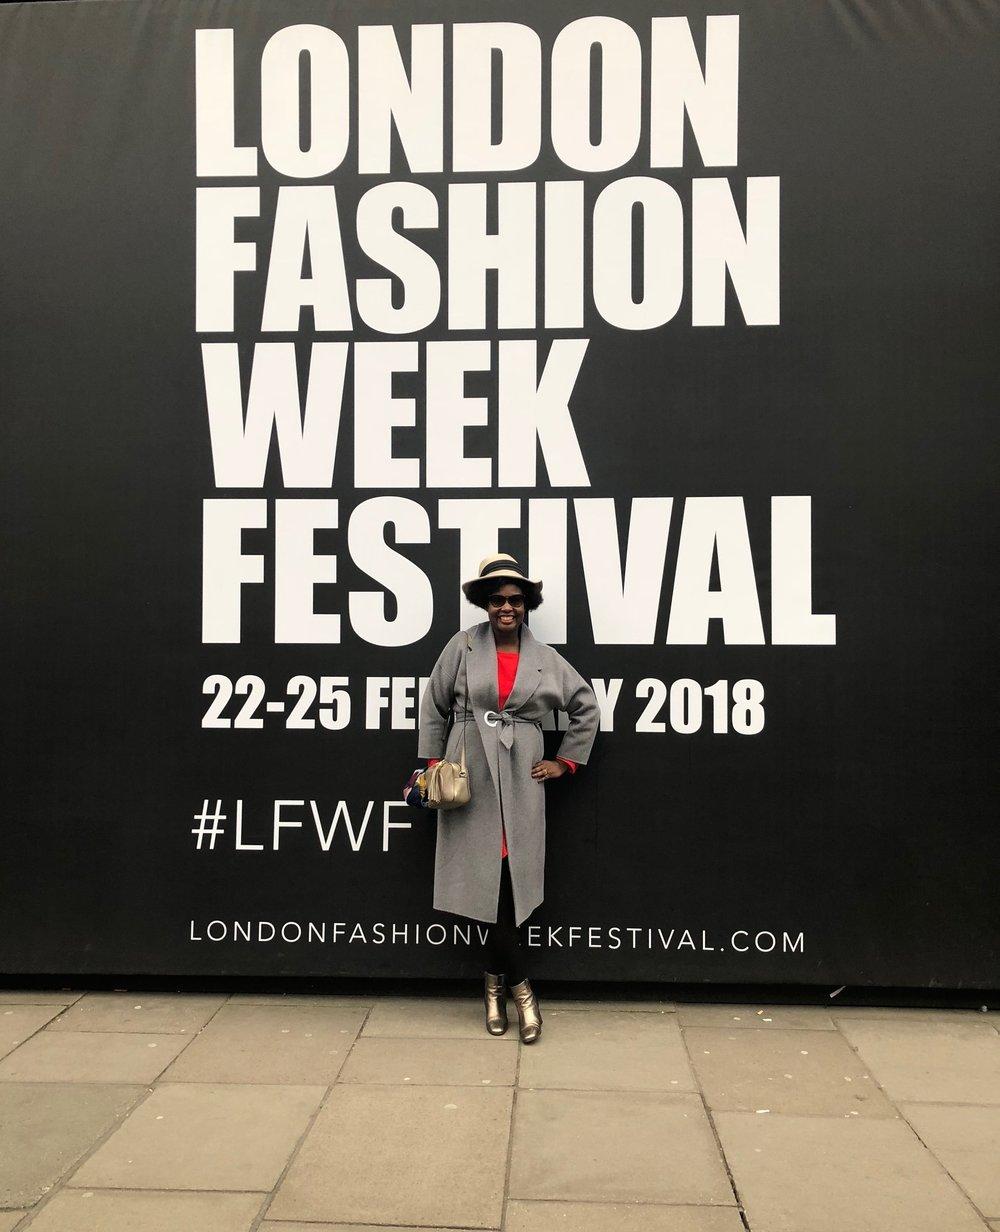 London-Fashion-week-Festival-photocall-elisa-les-bons-tuyaux.jpg